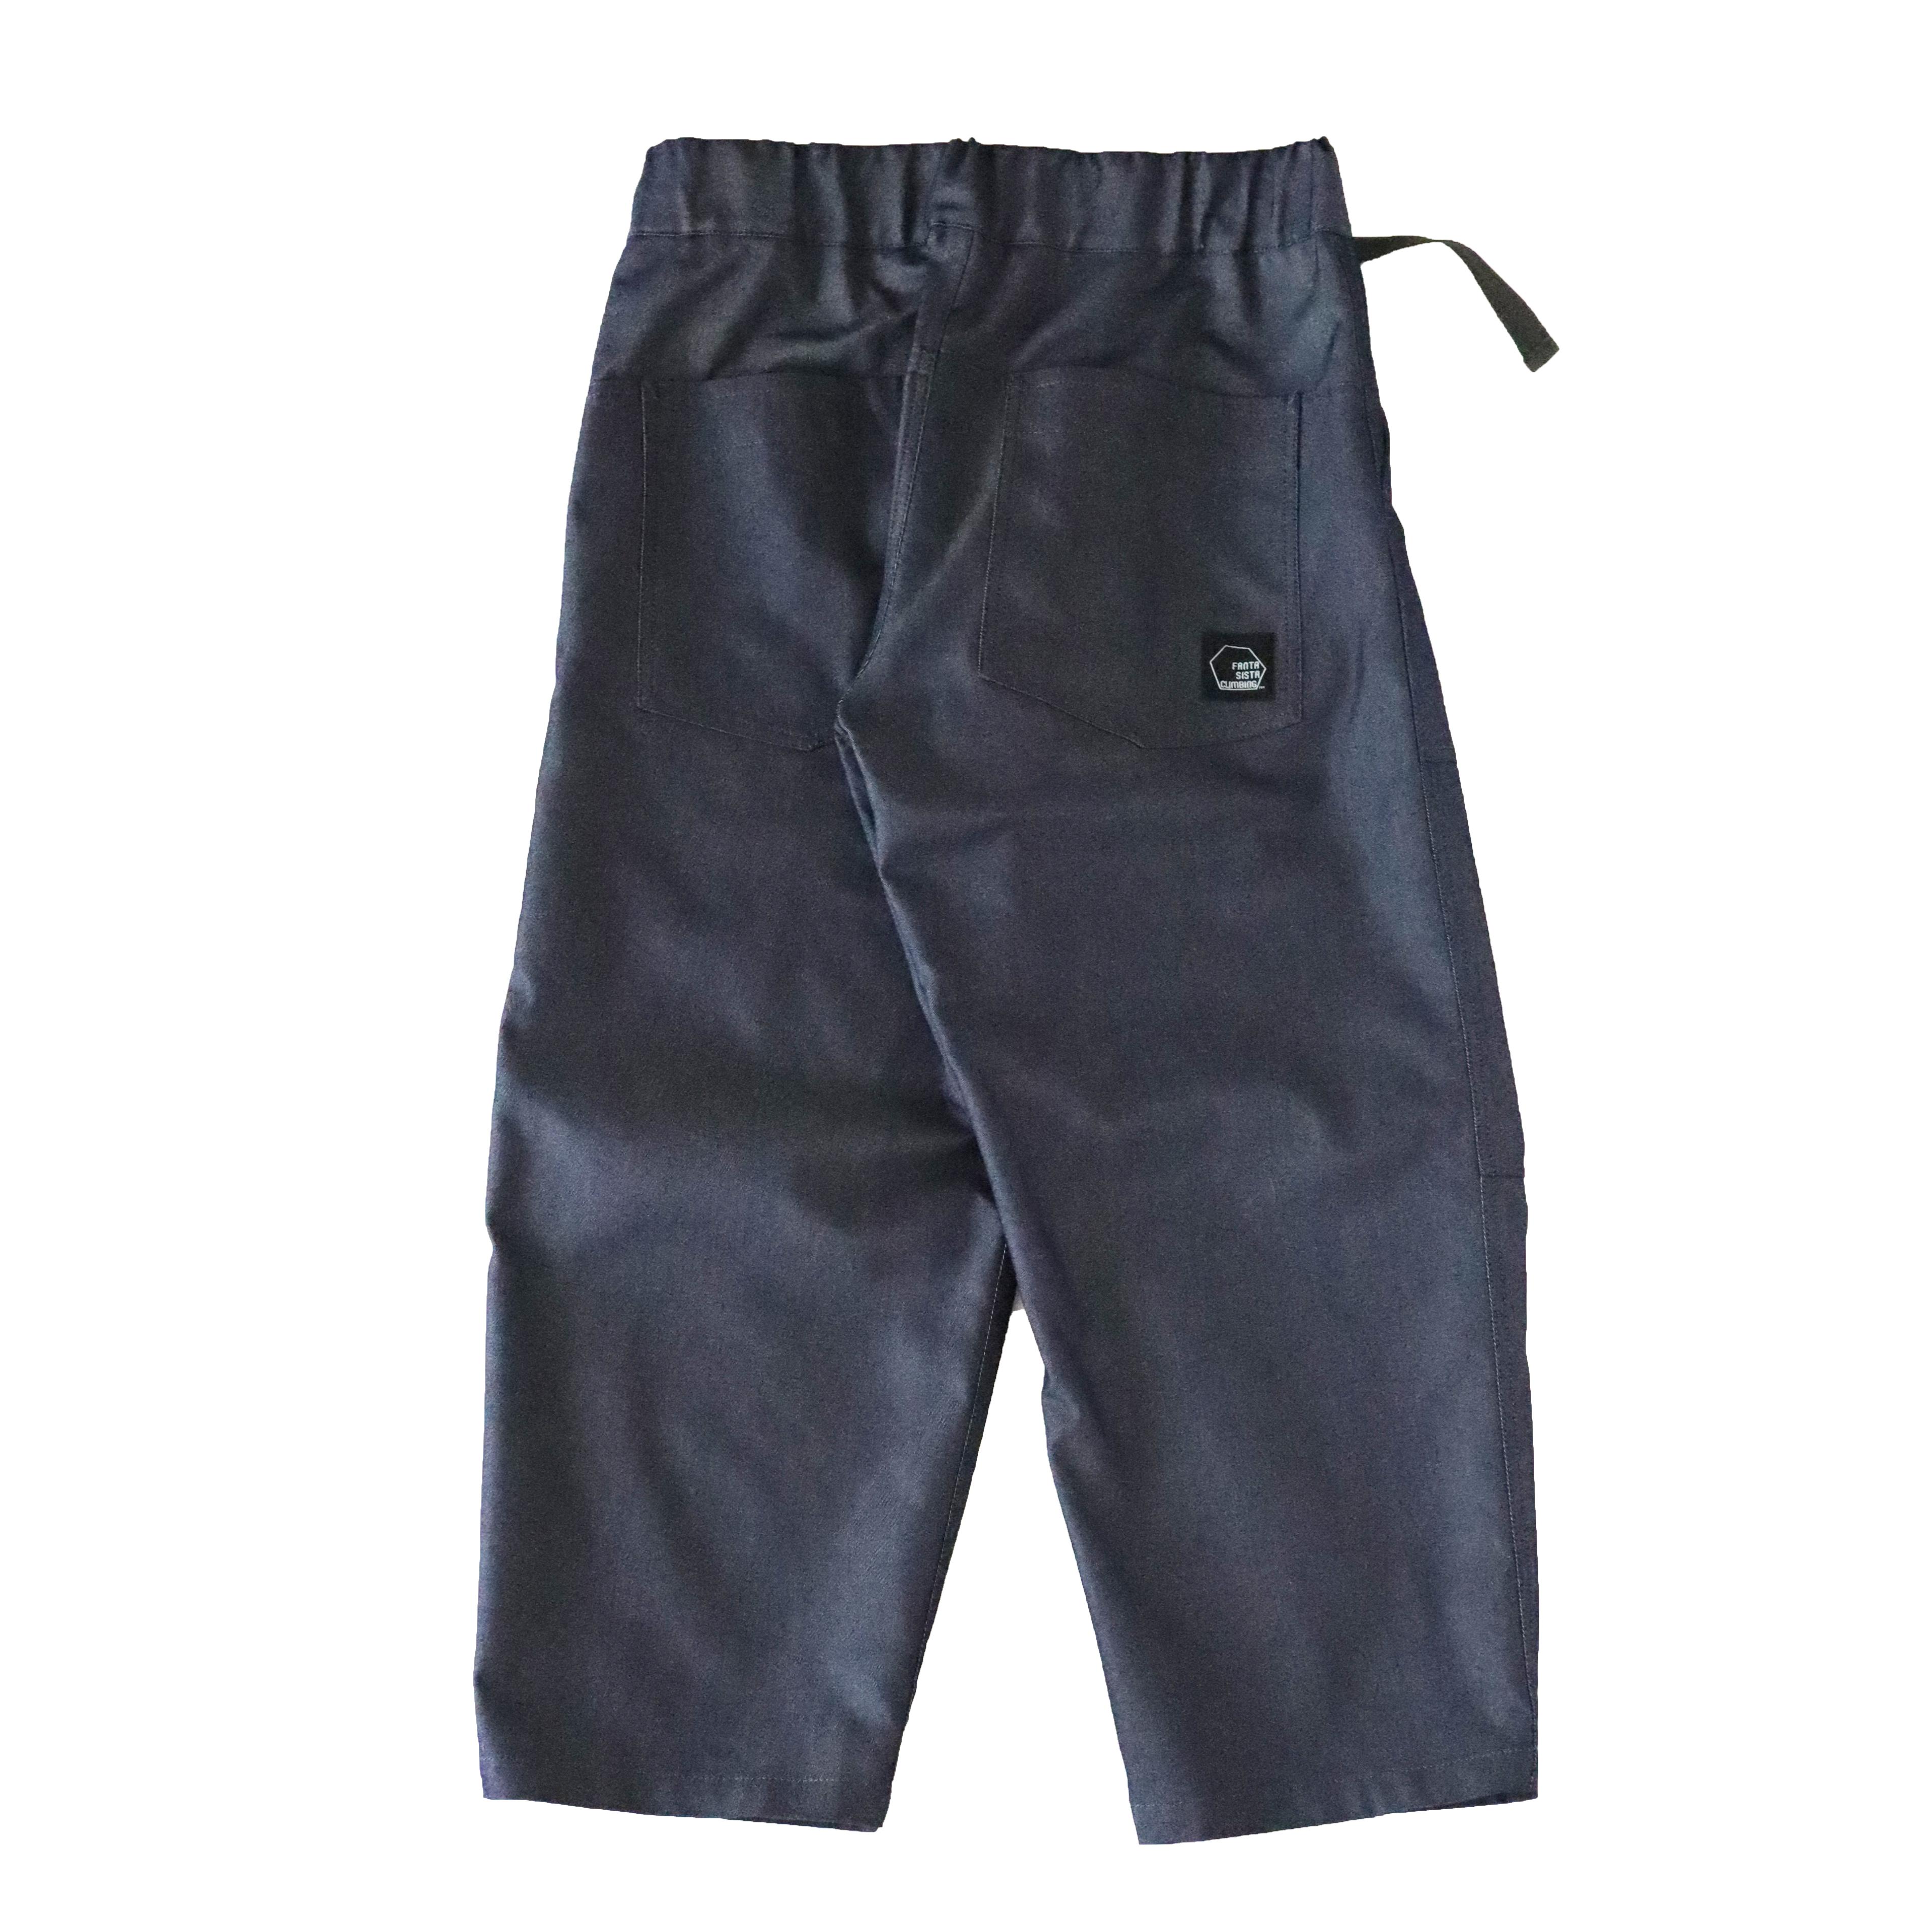 """ Daily pants - B """